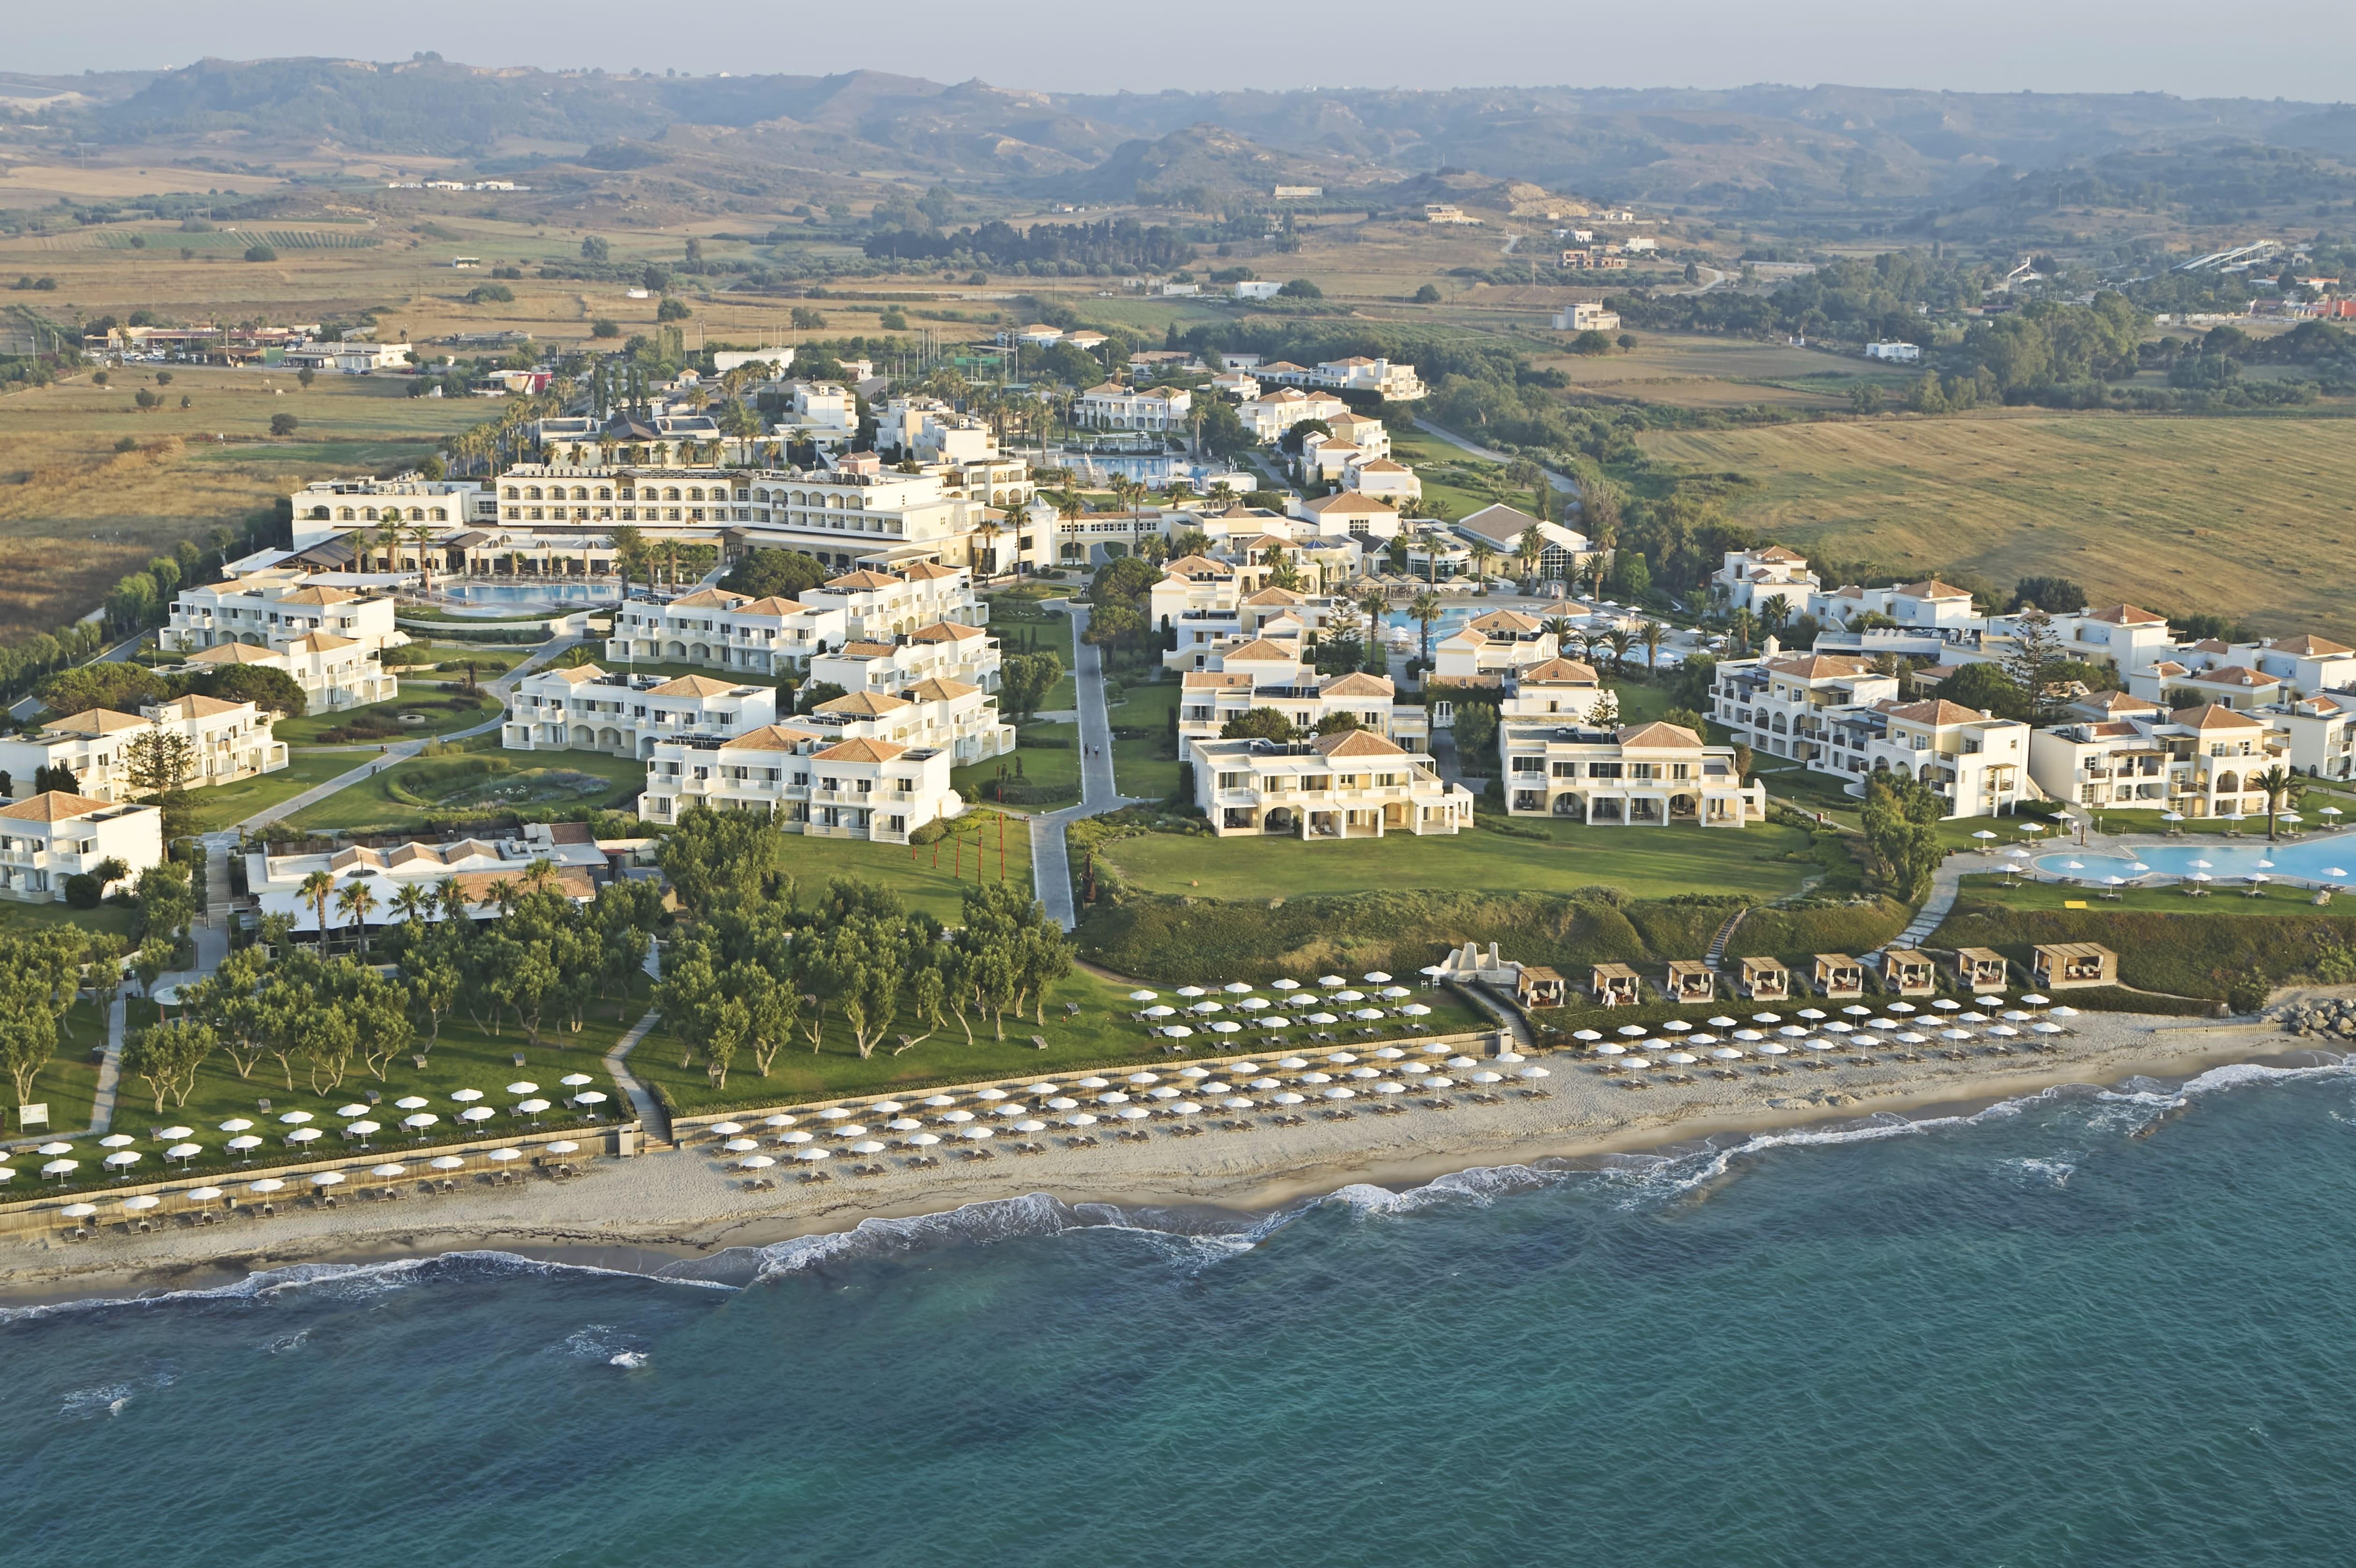 NEPTUNE HOTELS-RESORT, CONVENTION CENTRE & SPA